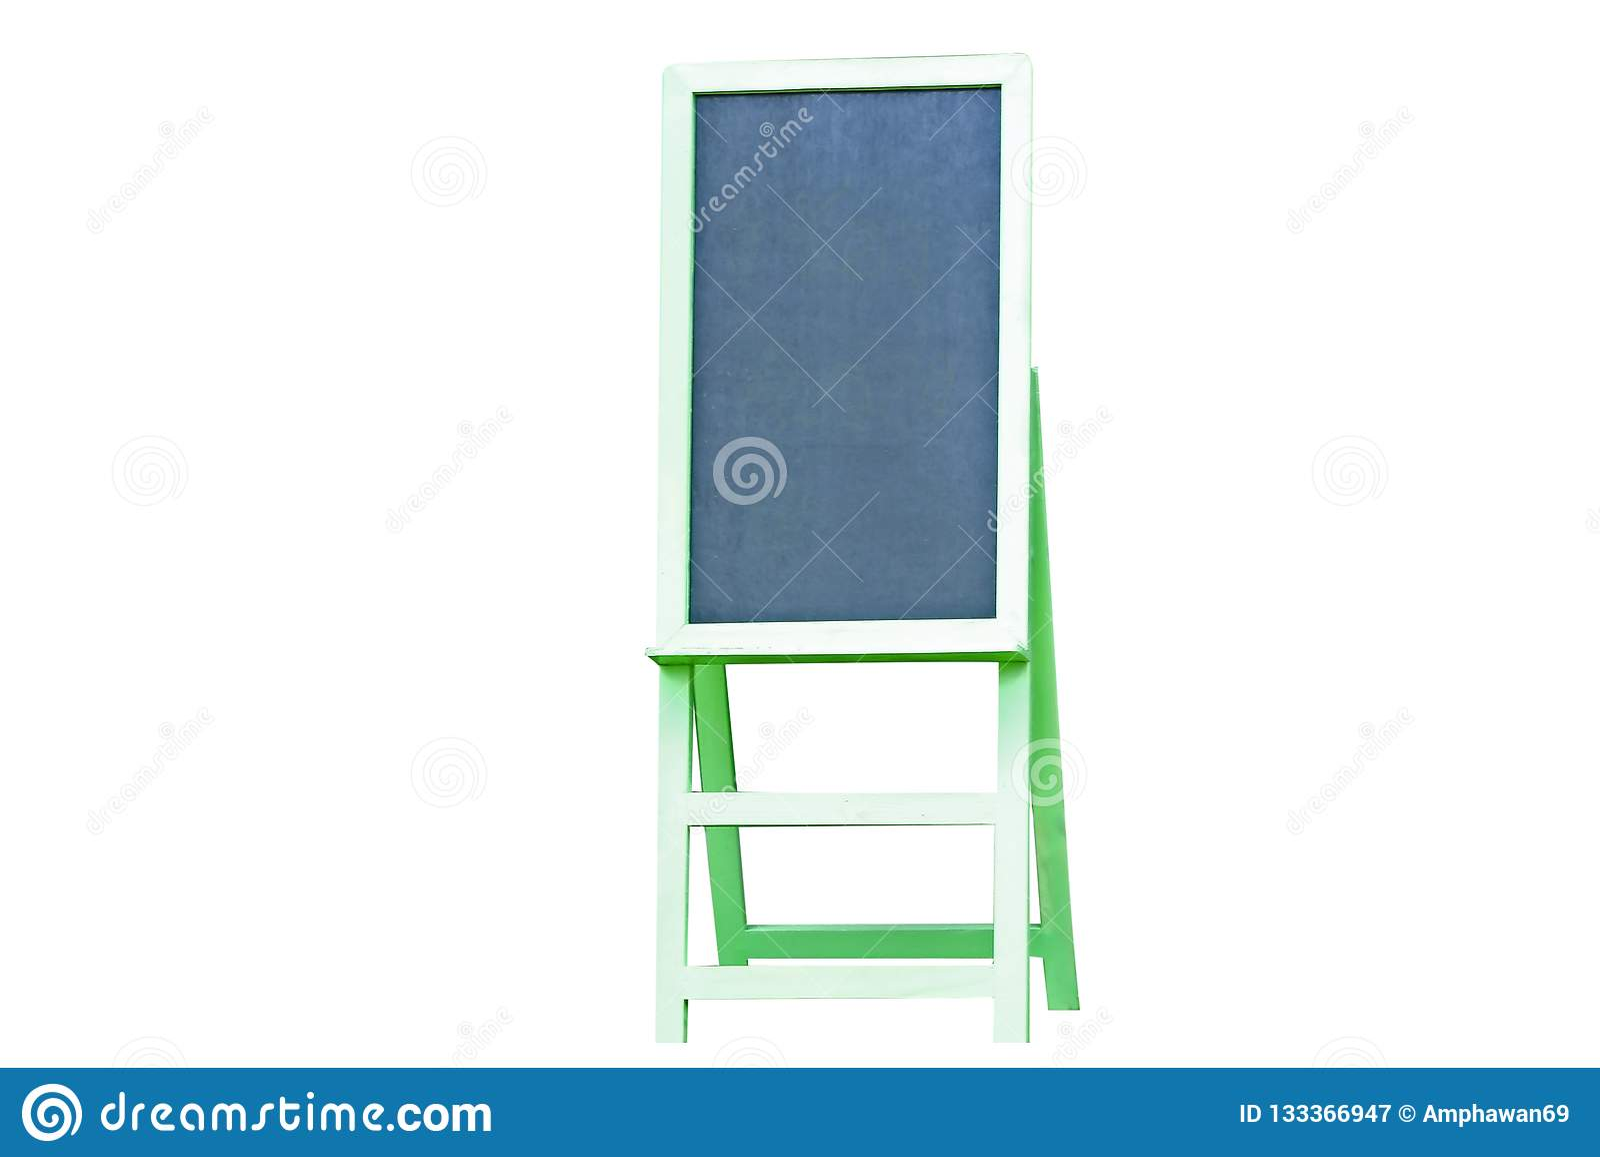 Green chalkboard menu isolated on white background